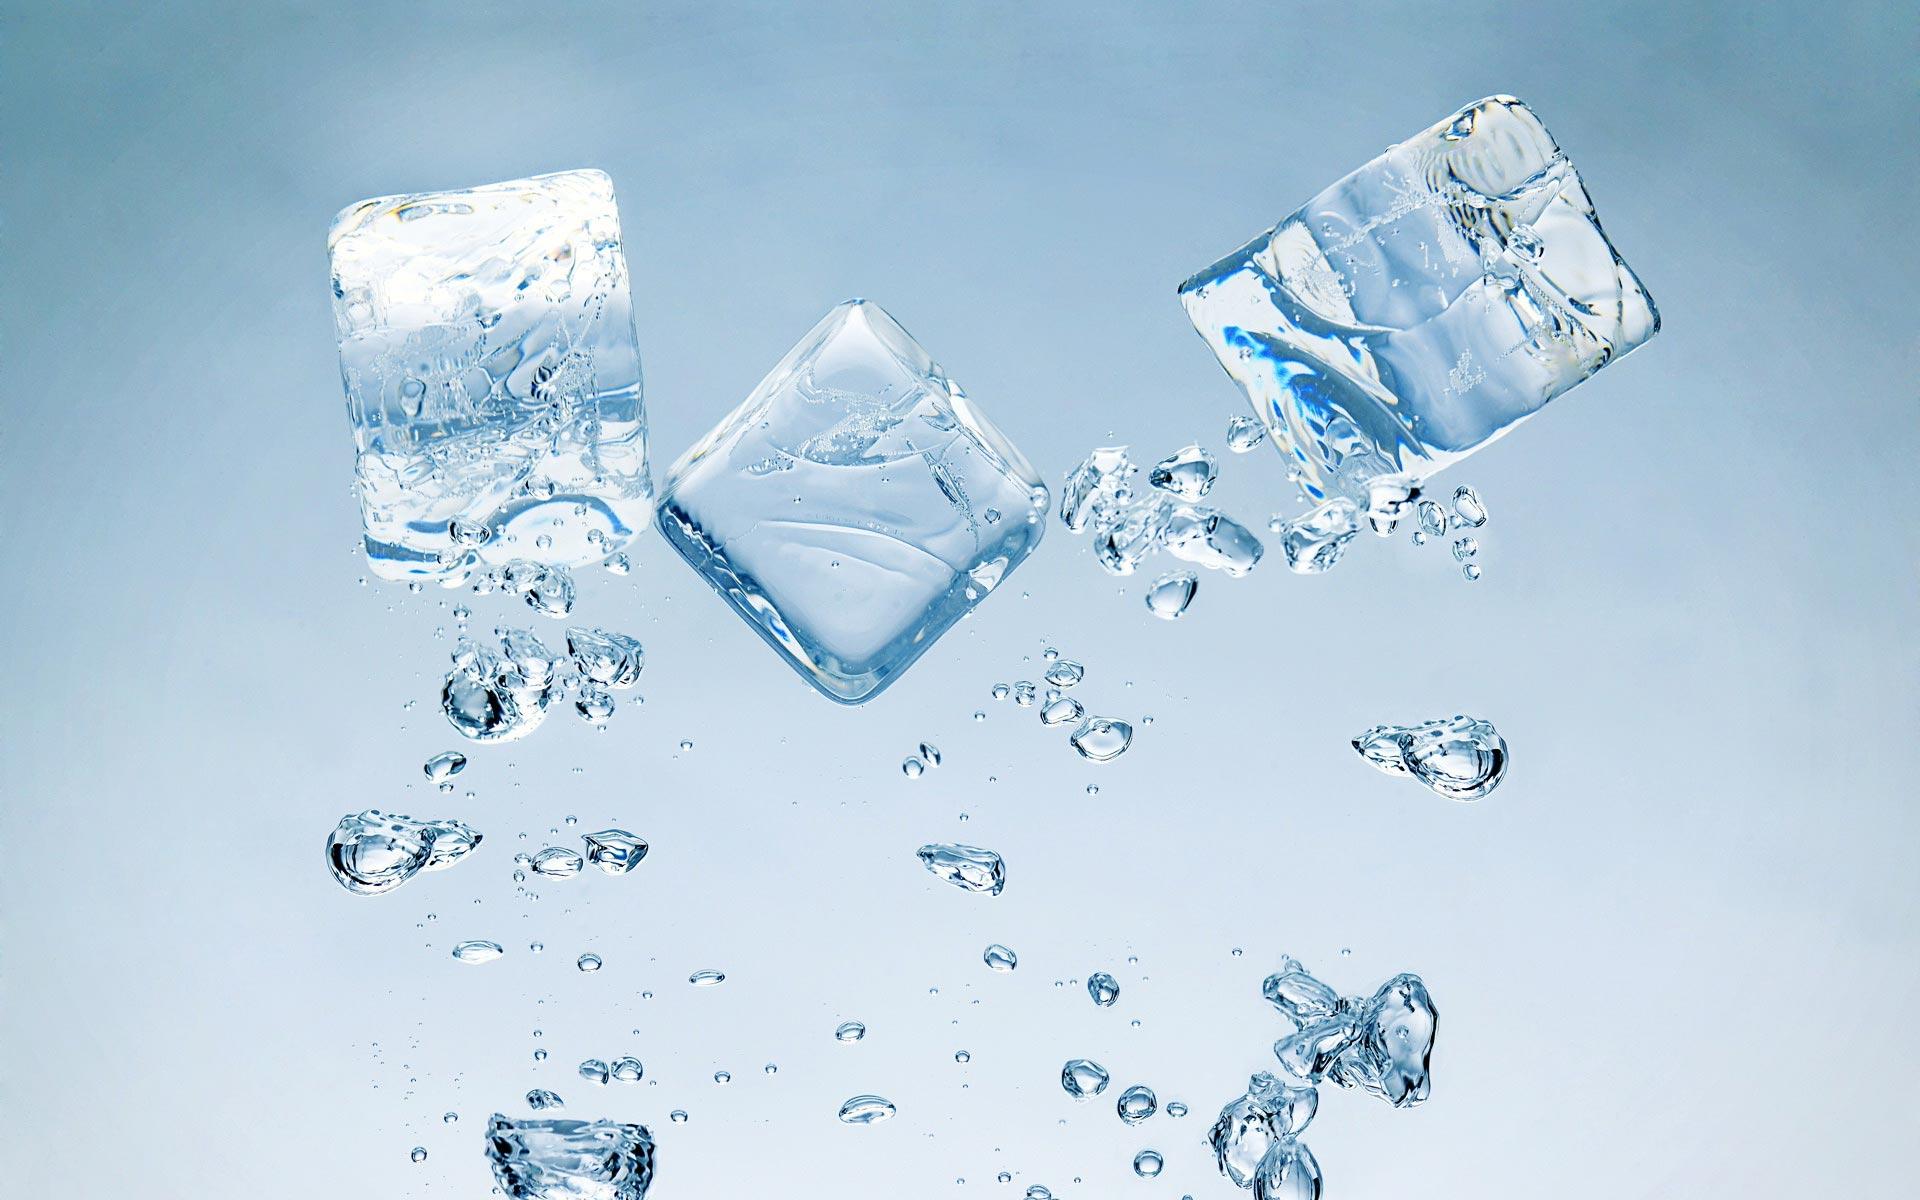 Falling Money Hd Wallpaper Motogp Riders Step Up For The Als Ice Bucket Challenge